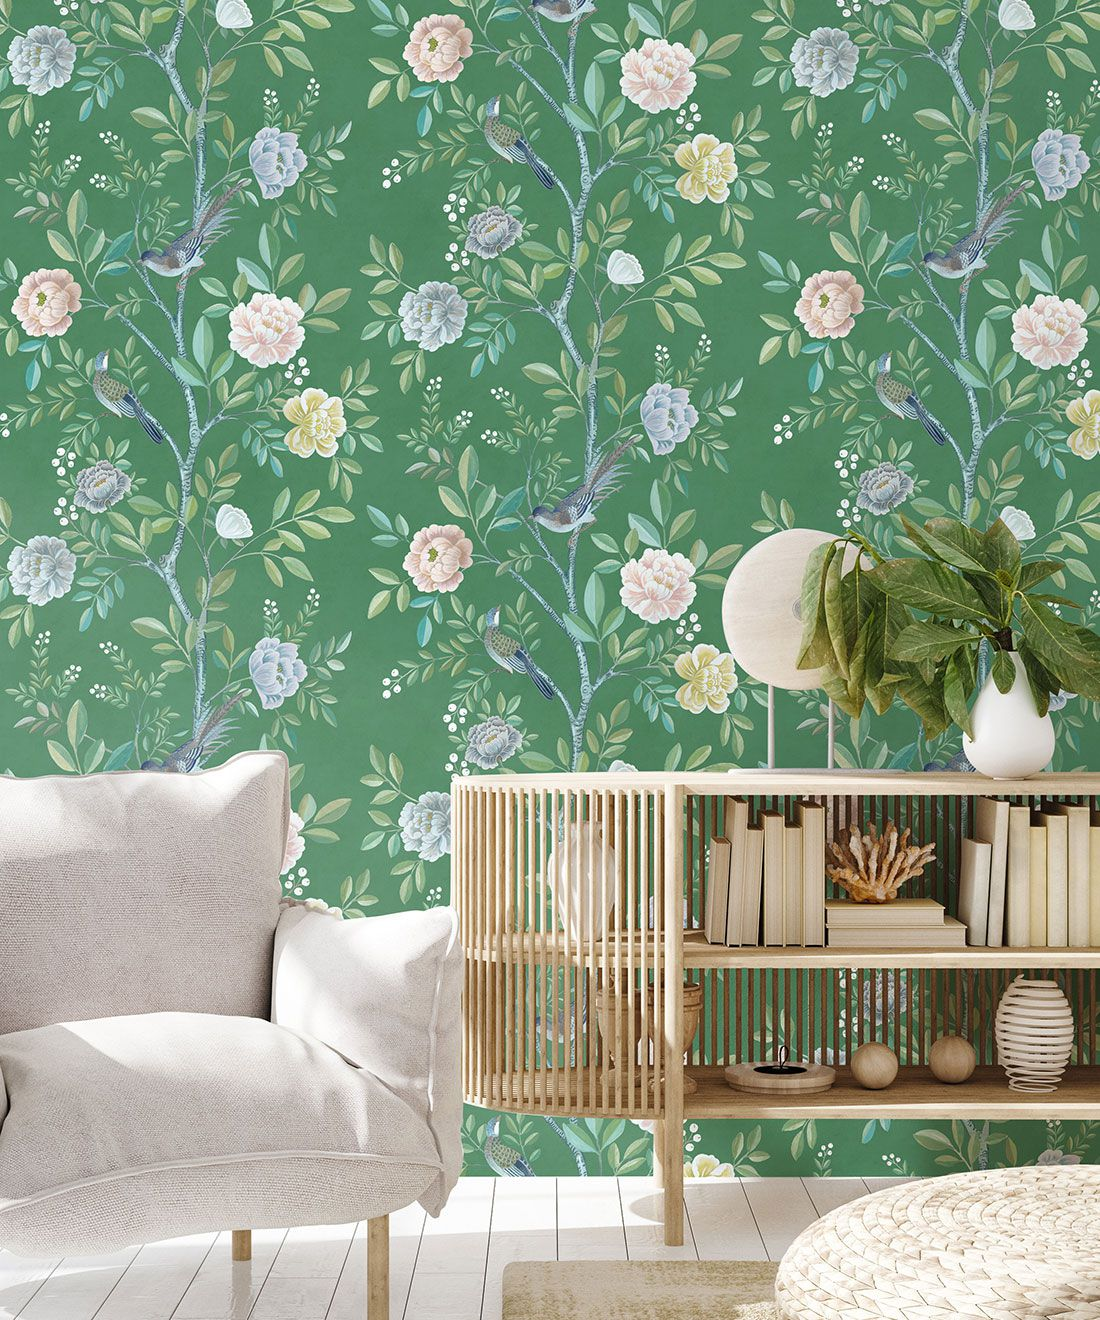 Chinoiserie Wallpaper •Floral Wallpaper •Bird Wallpaper • Magnolia • Forest Green • Insitu